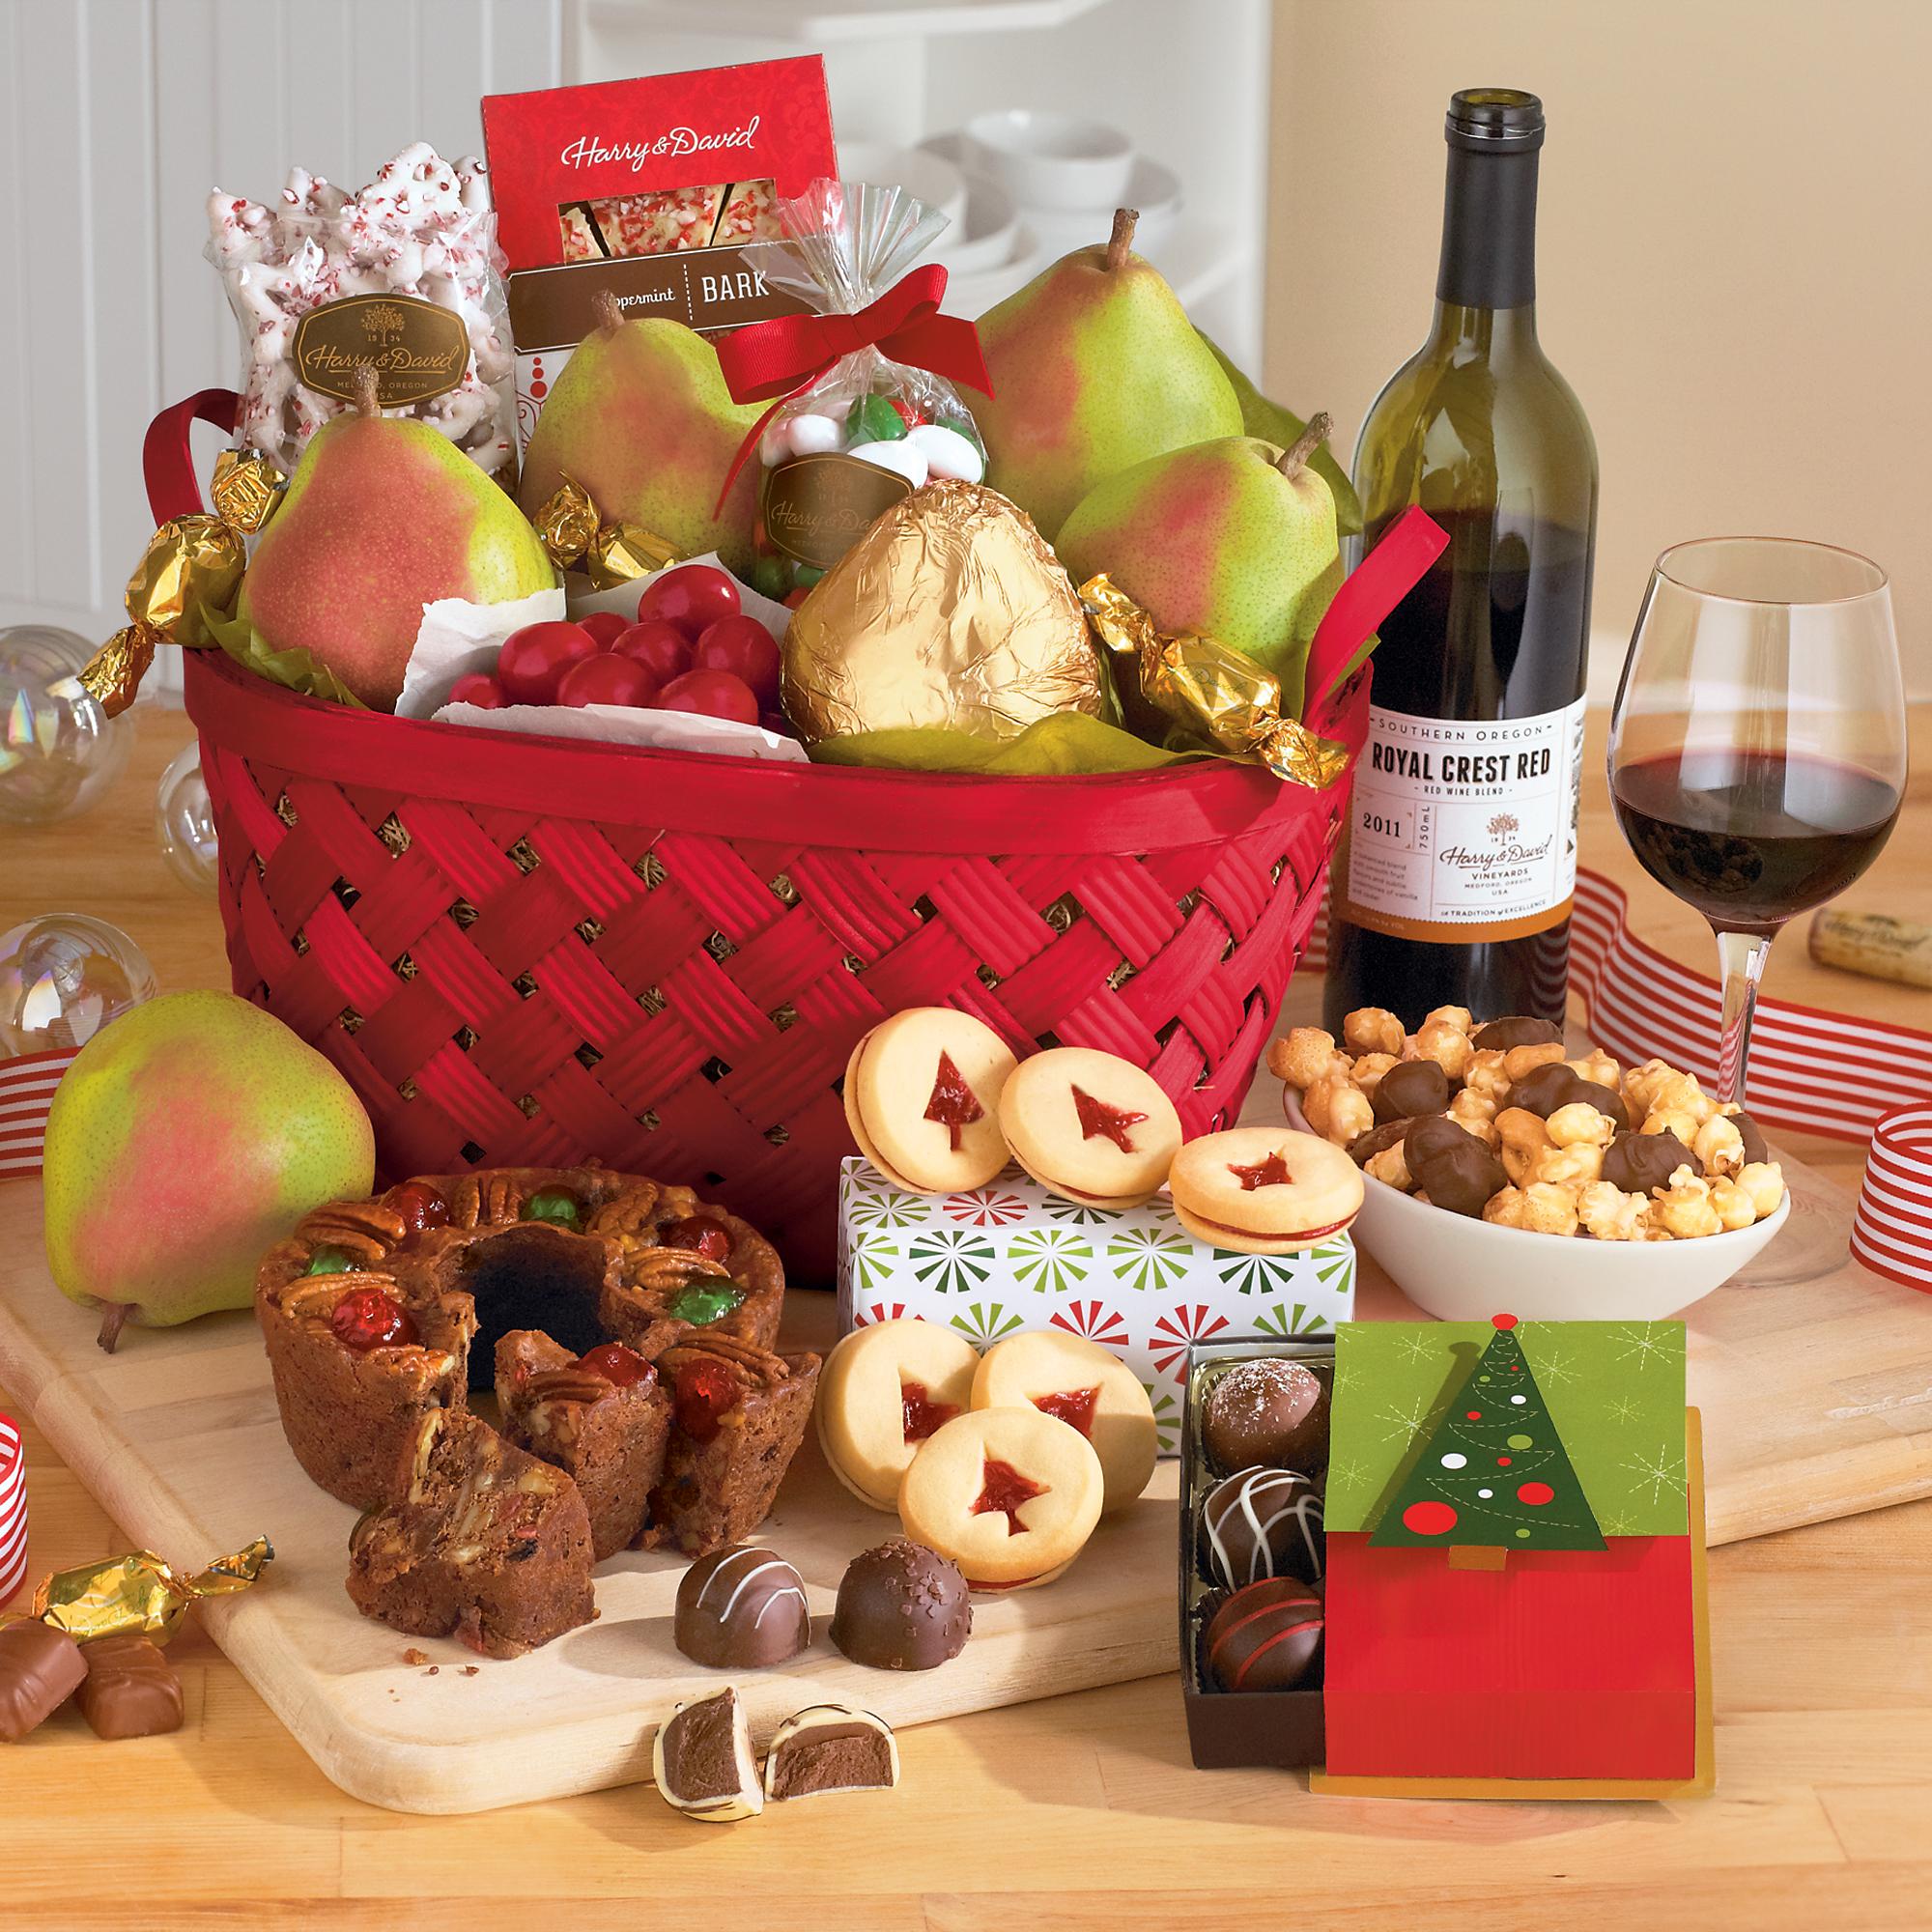 Gift Baskets Harry And David: Harry david organic fruit gift basket ...